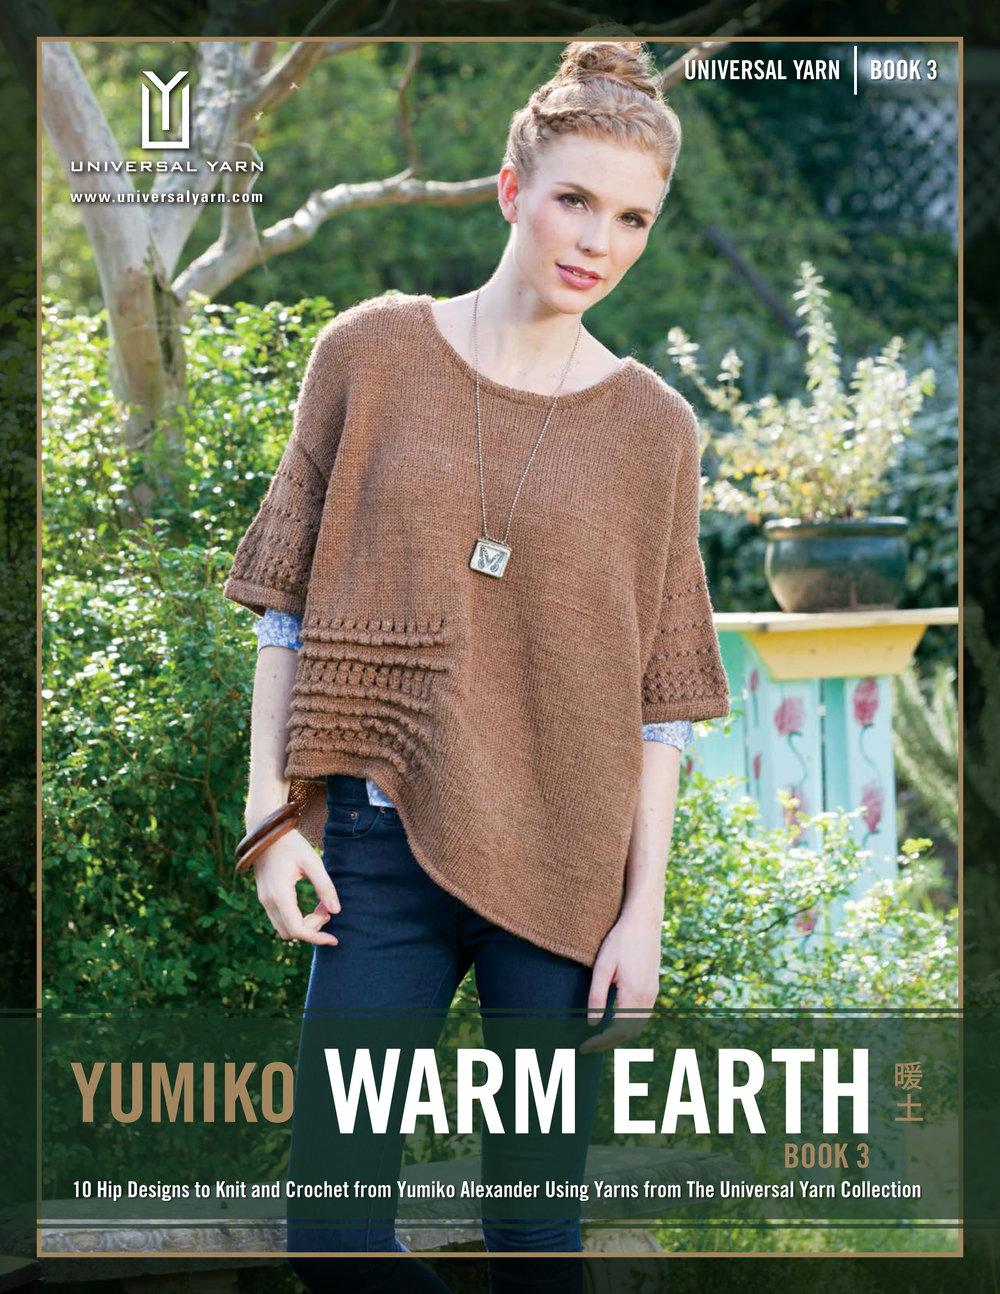 Yumiko Warm Earth 3 (2012)